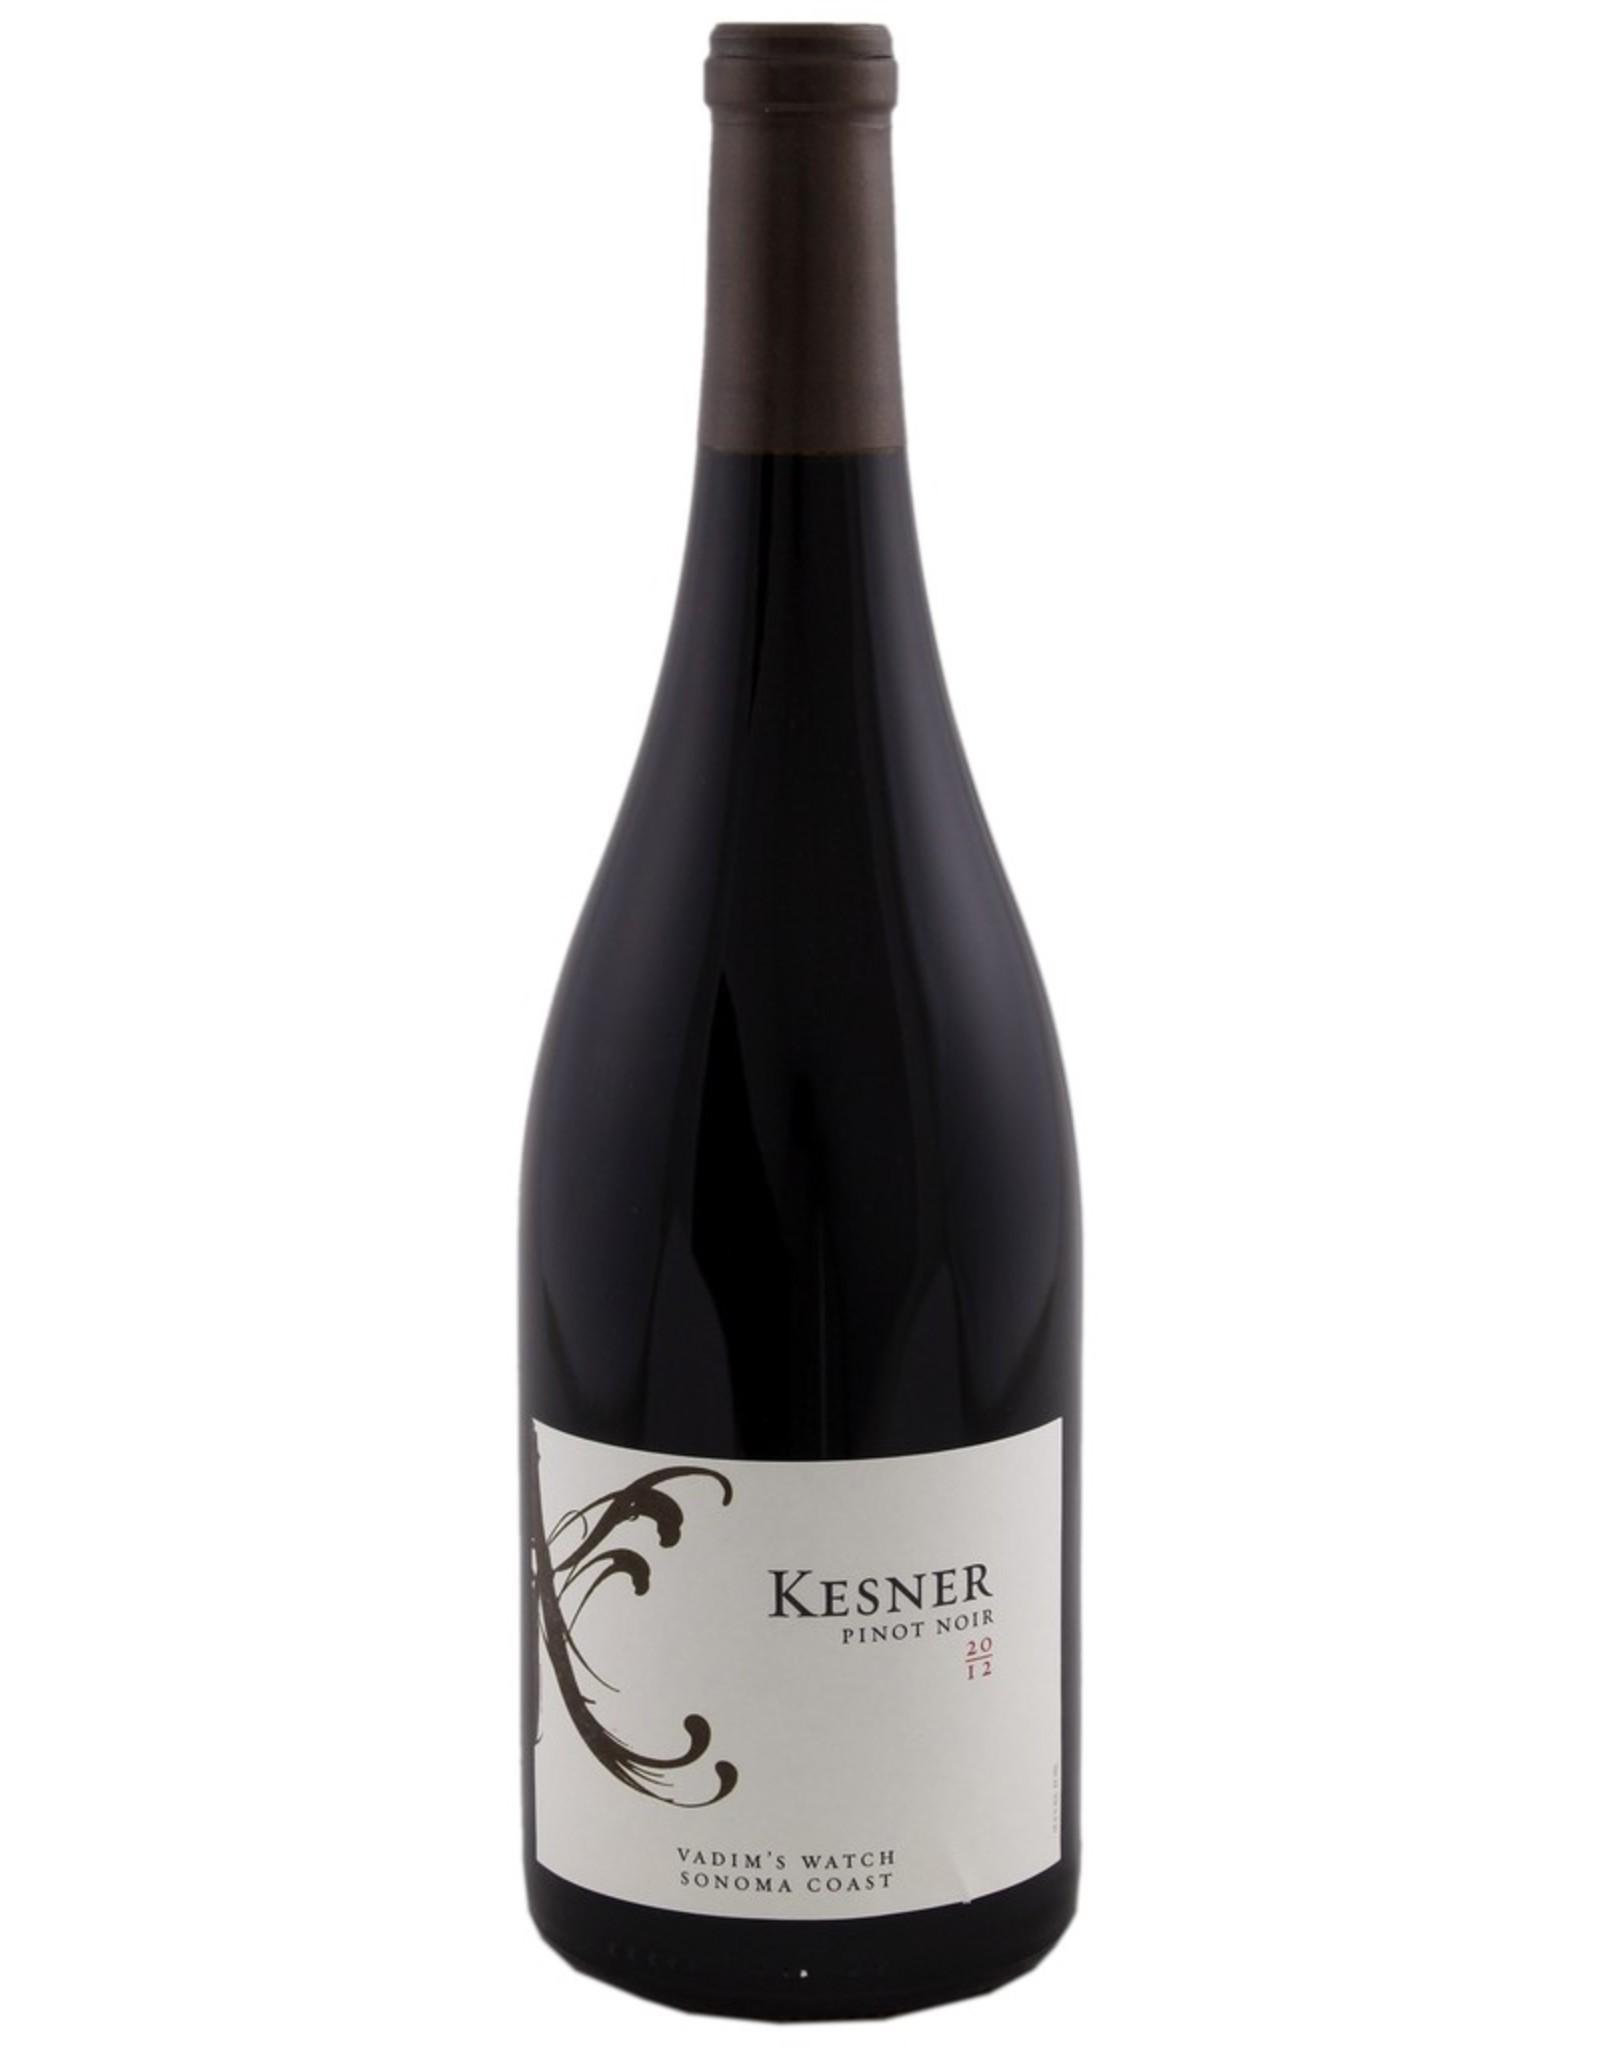 Red Wine 2013, Kesner, Vadim's Watch, Pinot Noir, Sonoma Coast, Sonoma County, California, 13.8% Alc, CT92